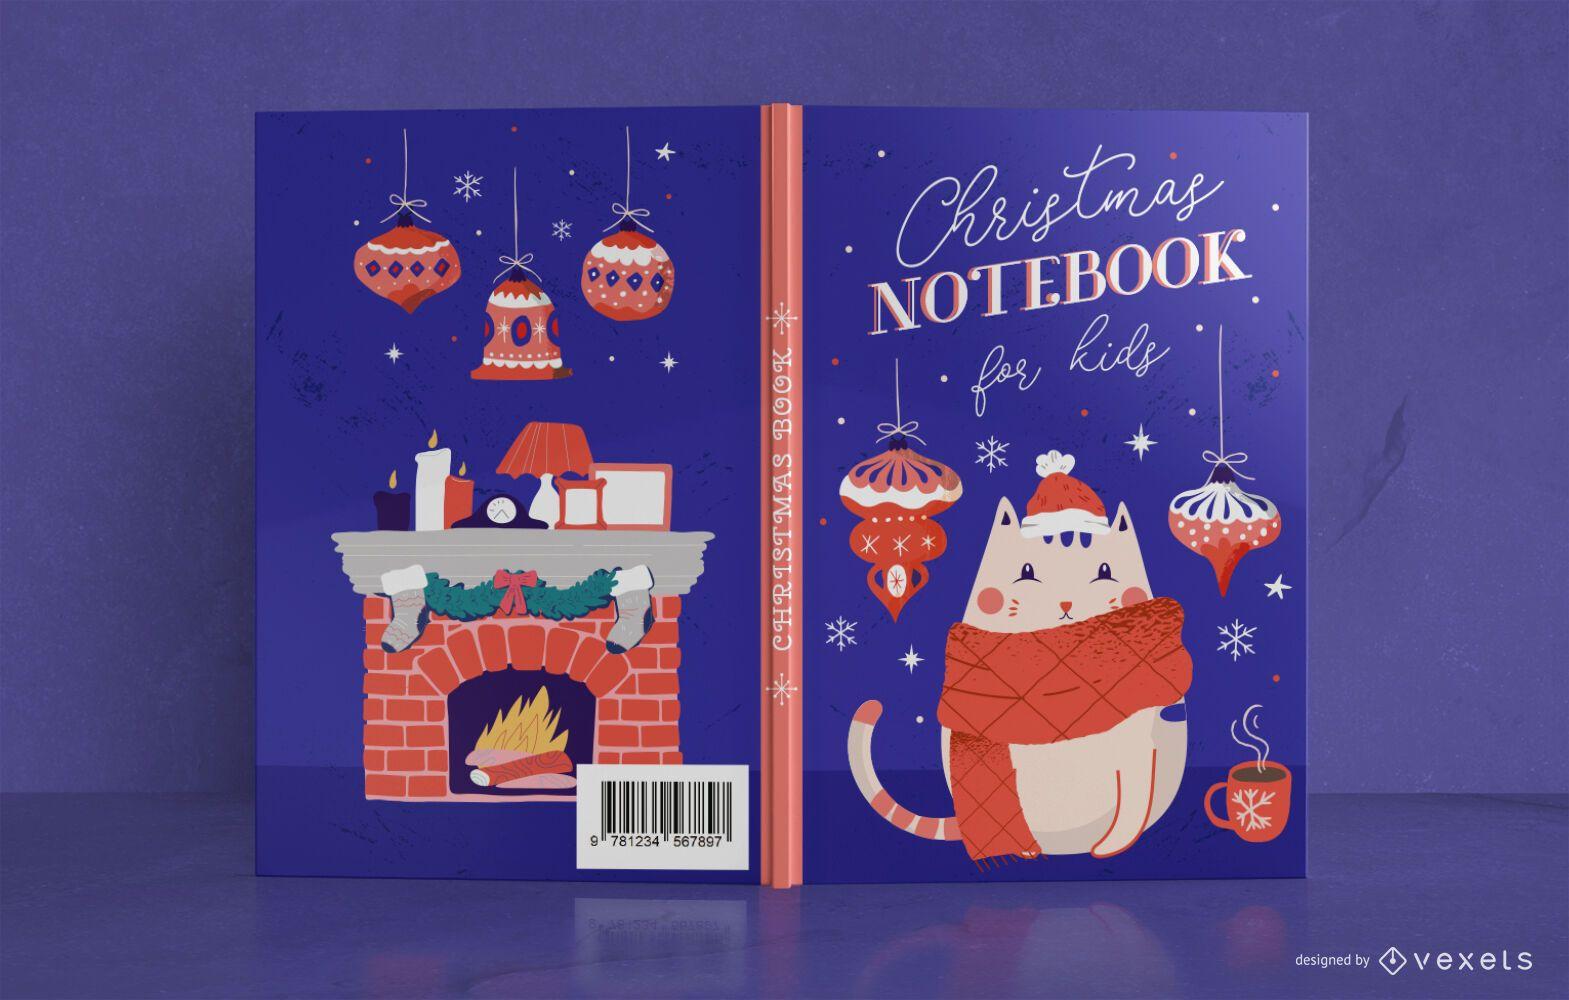 Christmas kids book cover design